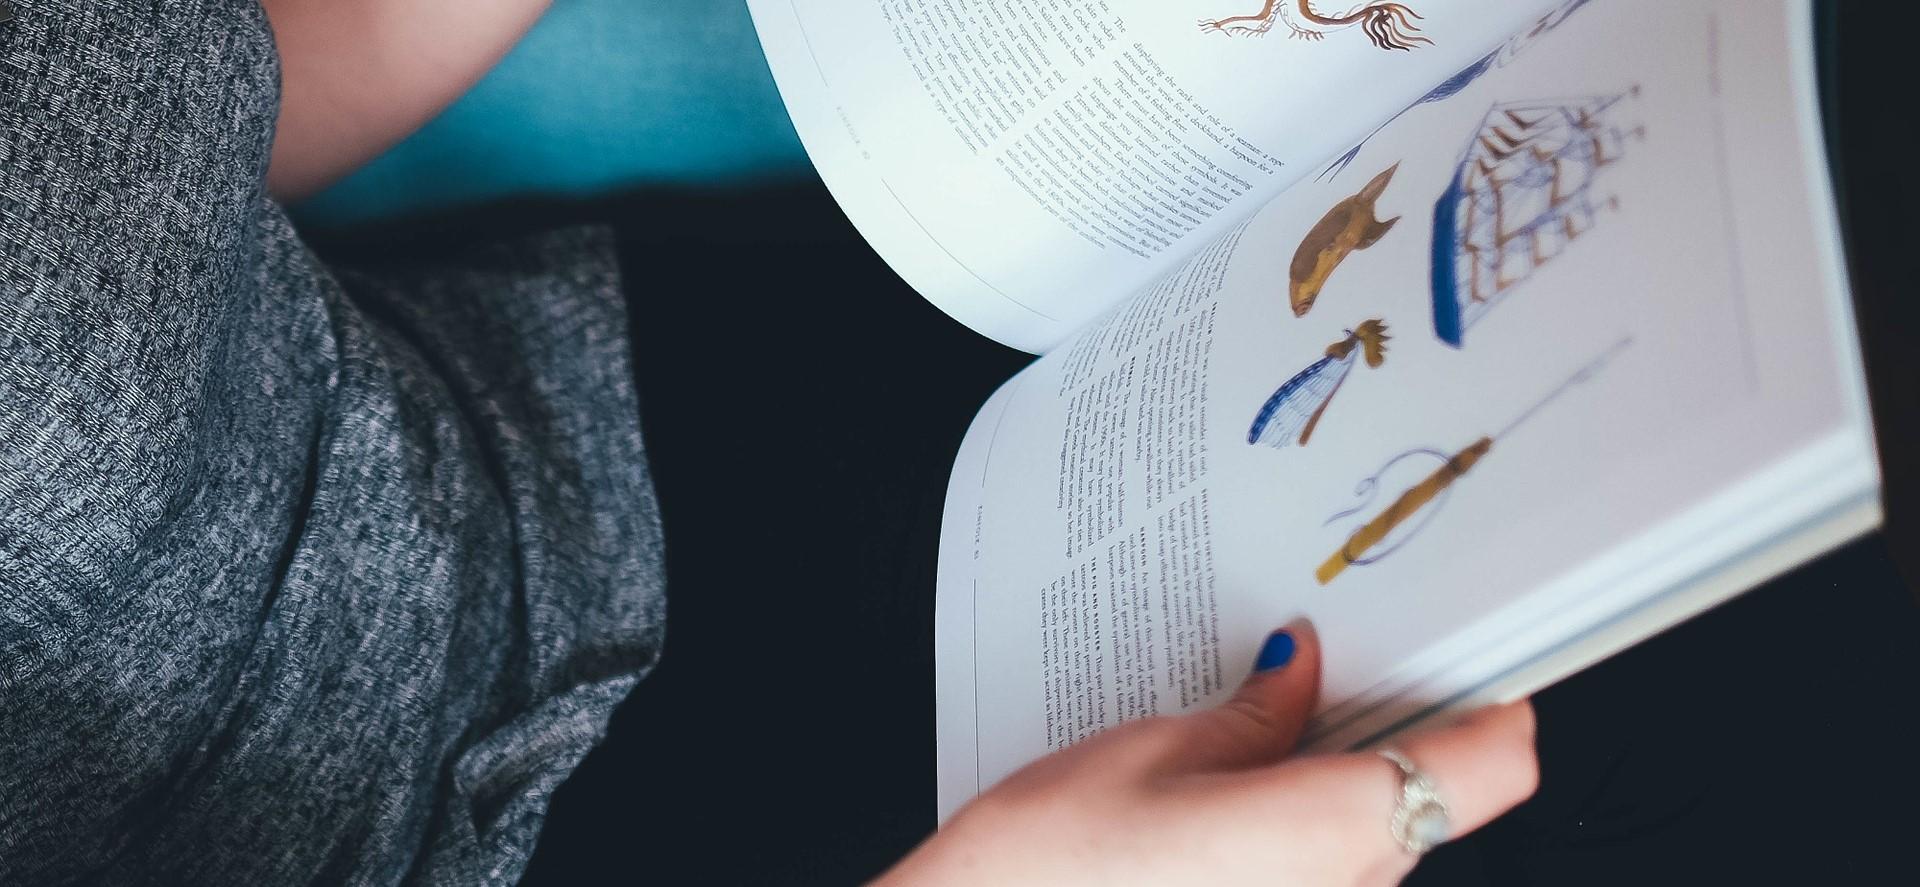 reading-1209174_1920.jpg